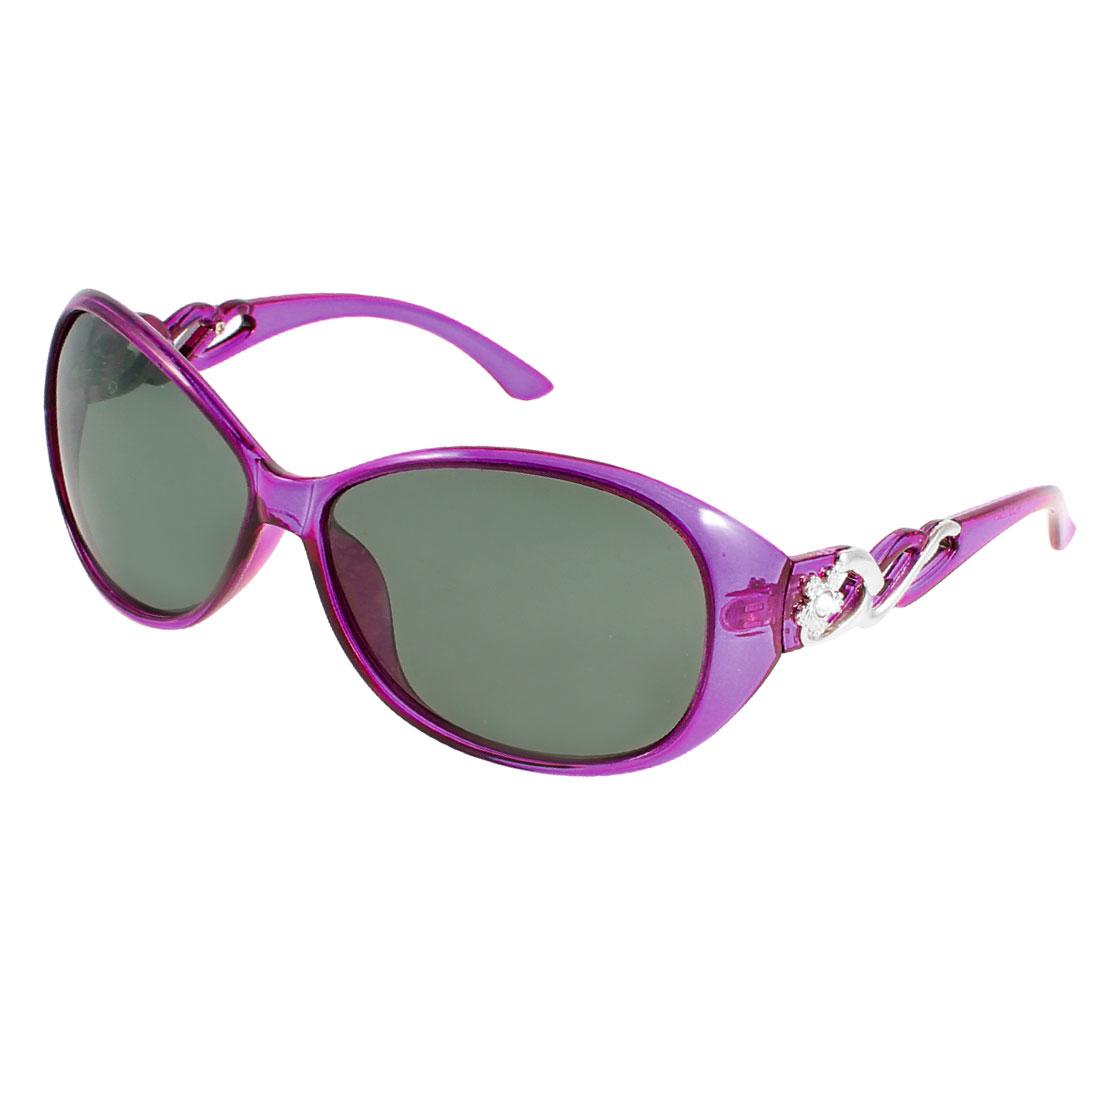 Lady Purple Plastic Rhinestone Flower Adorning Single Bridge Polarized Sunglasses